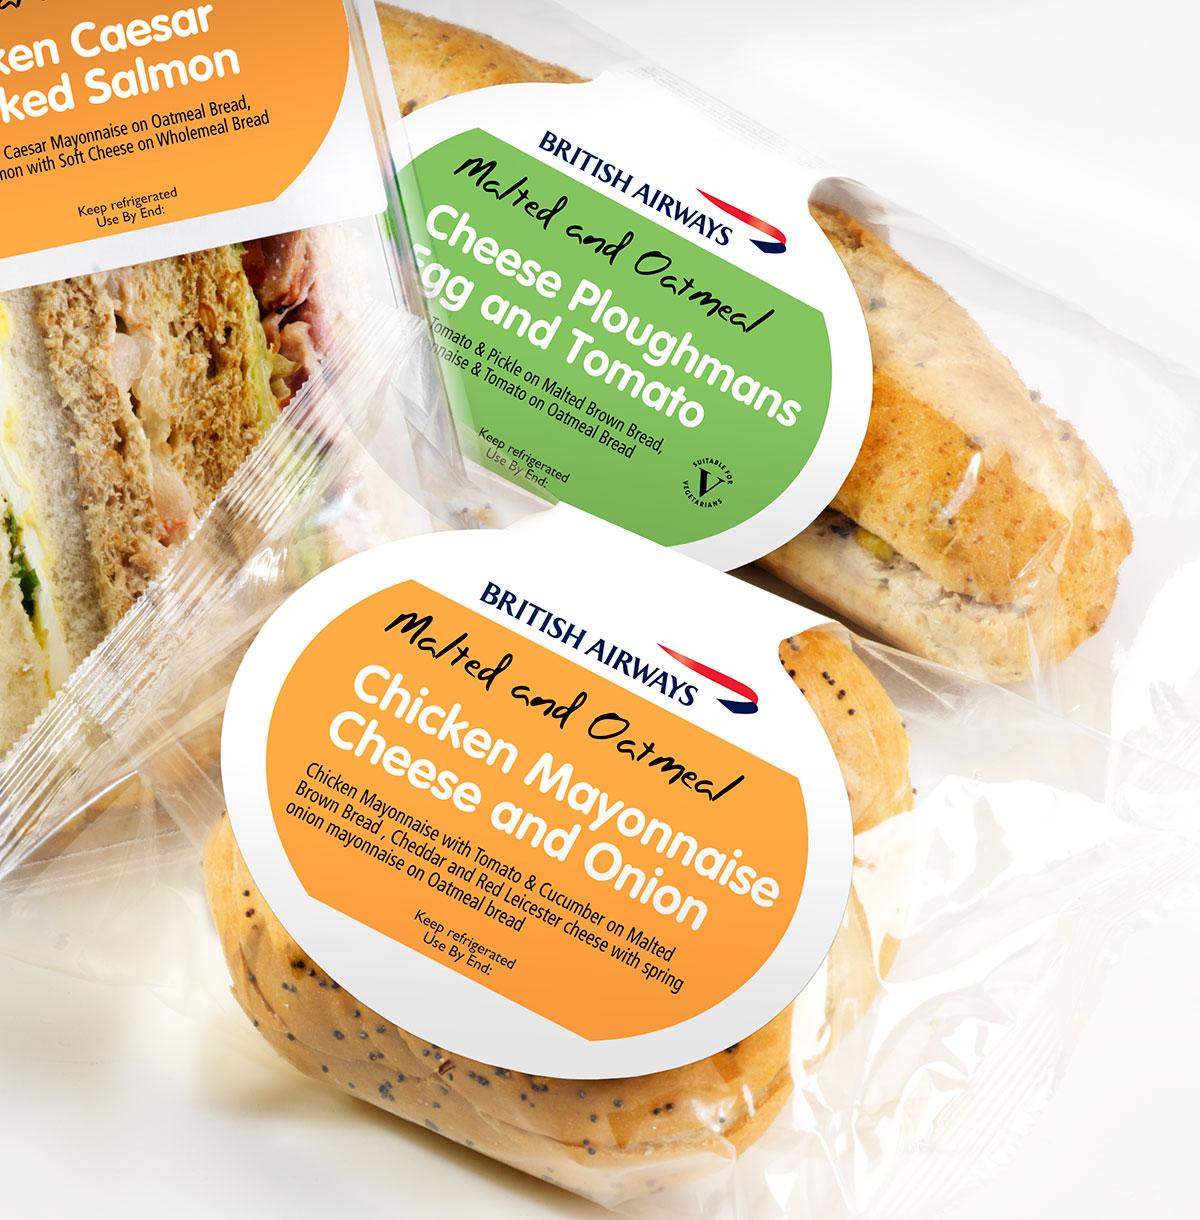 Greencore British Airways Sandwich Packaging